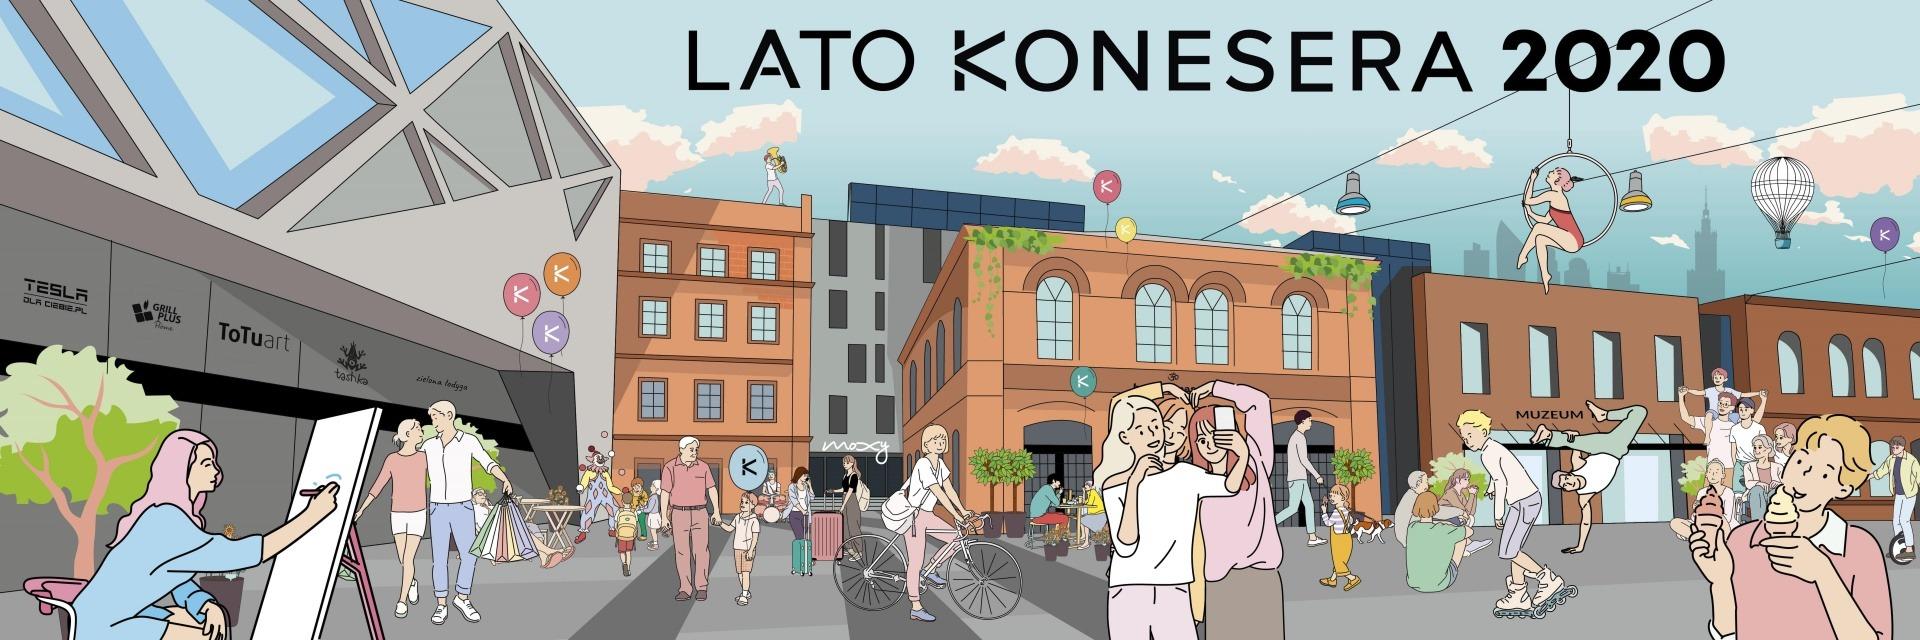 Lato Konesera